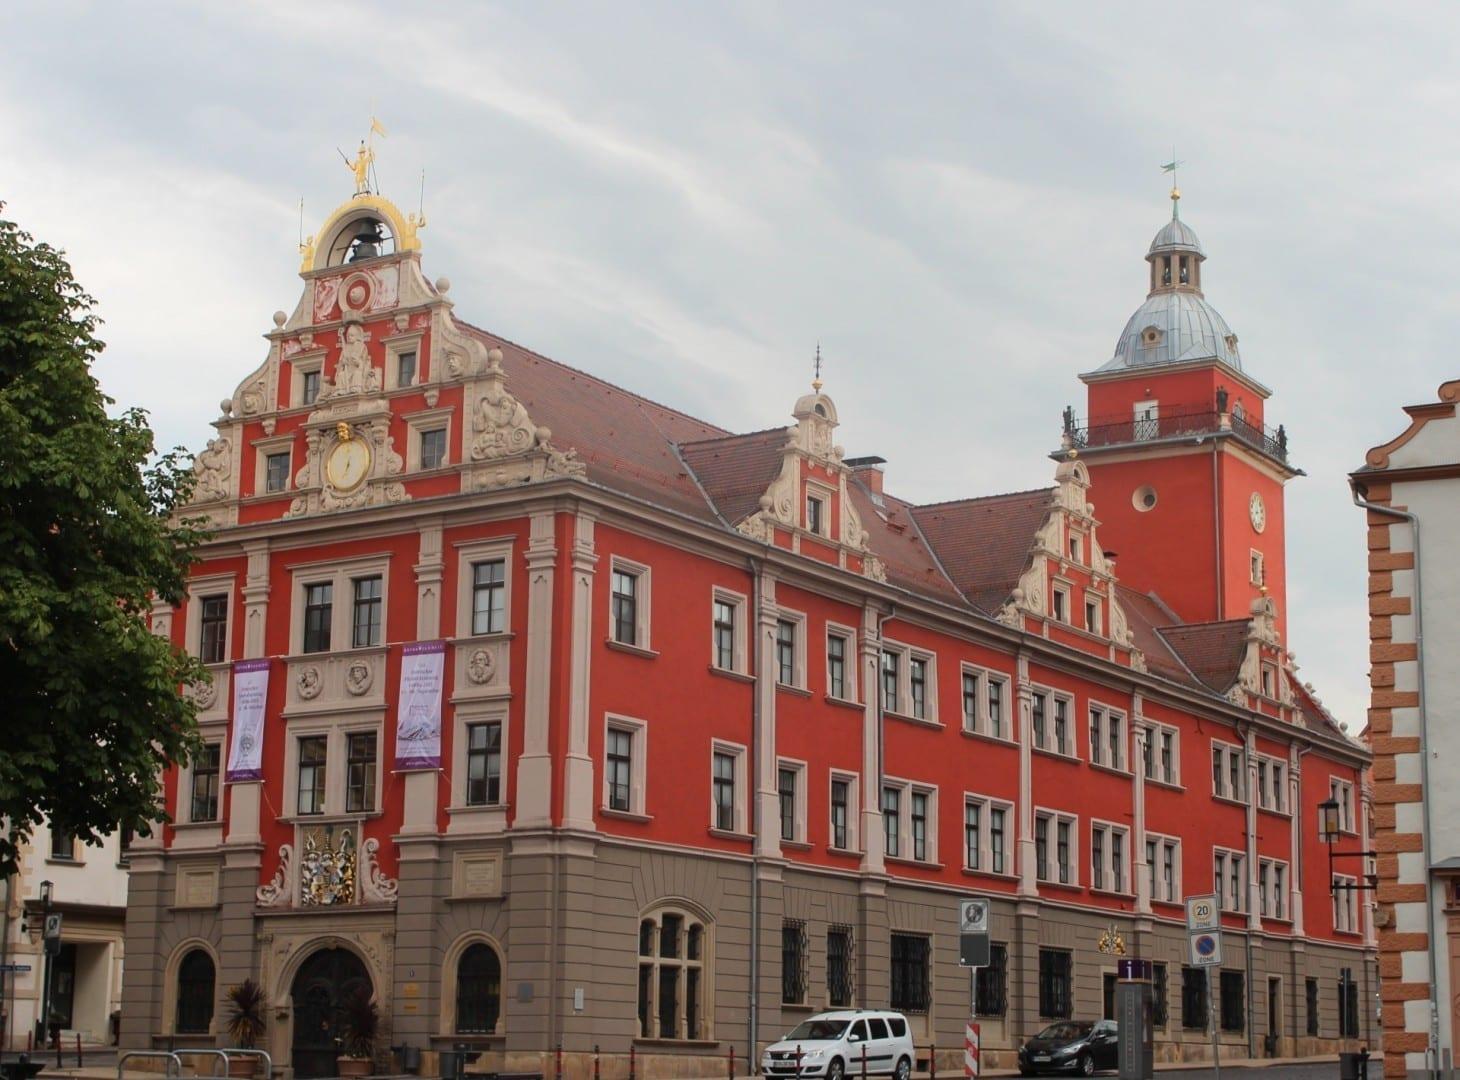 Antiguo ayuntamiento, Gotha Gotha Alemania